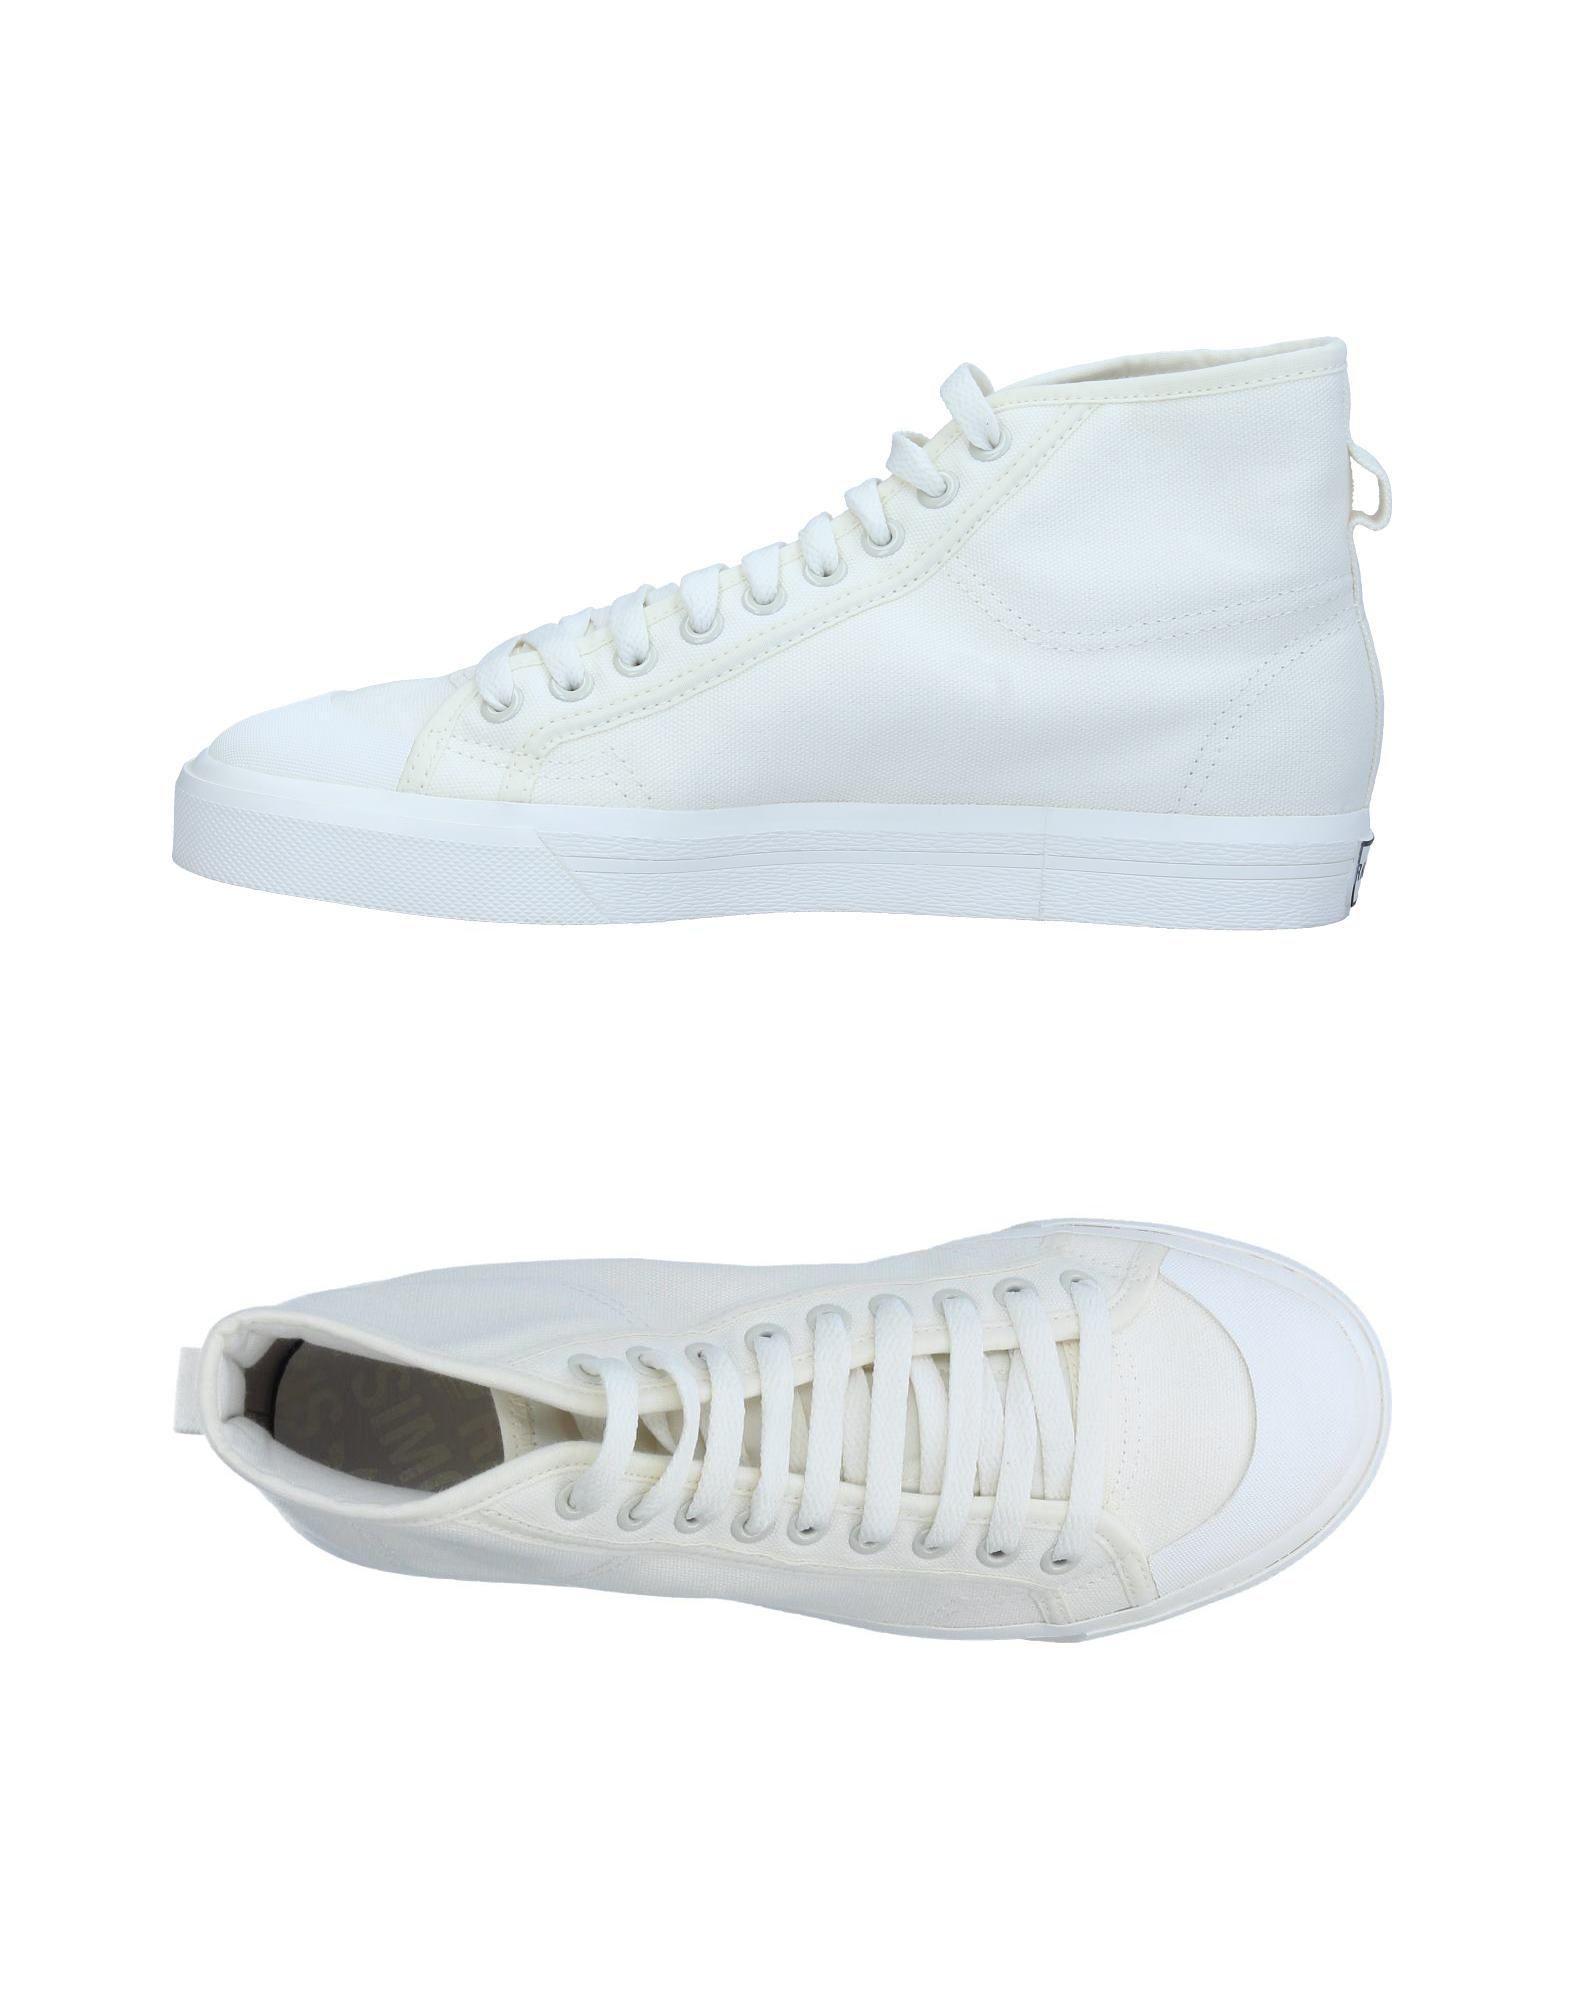 Adidas By Raf Simons Sneakers Herren  11442610CU Gute Qualität beliebte Schuhe